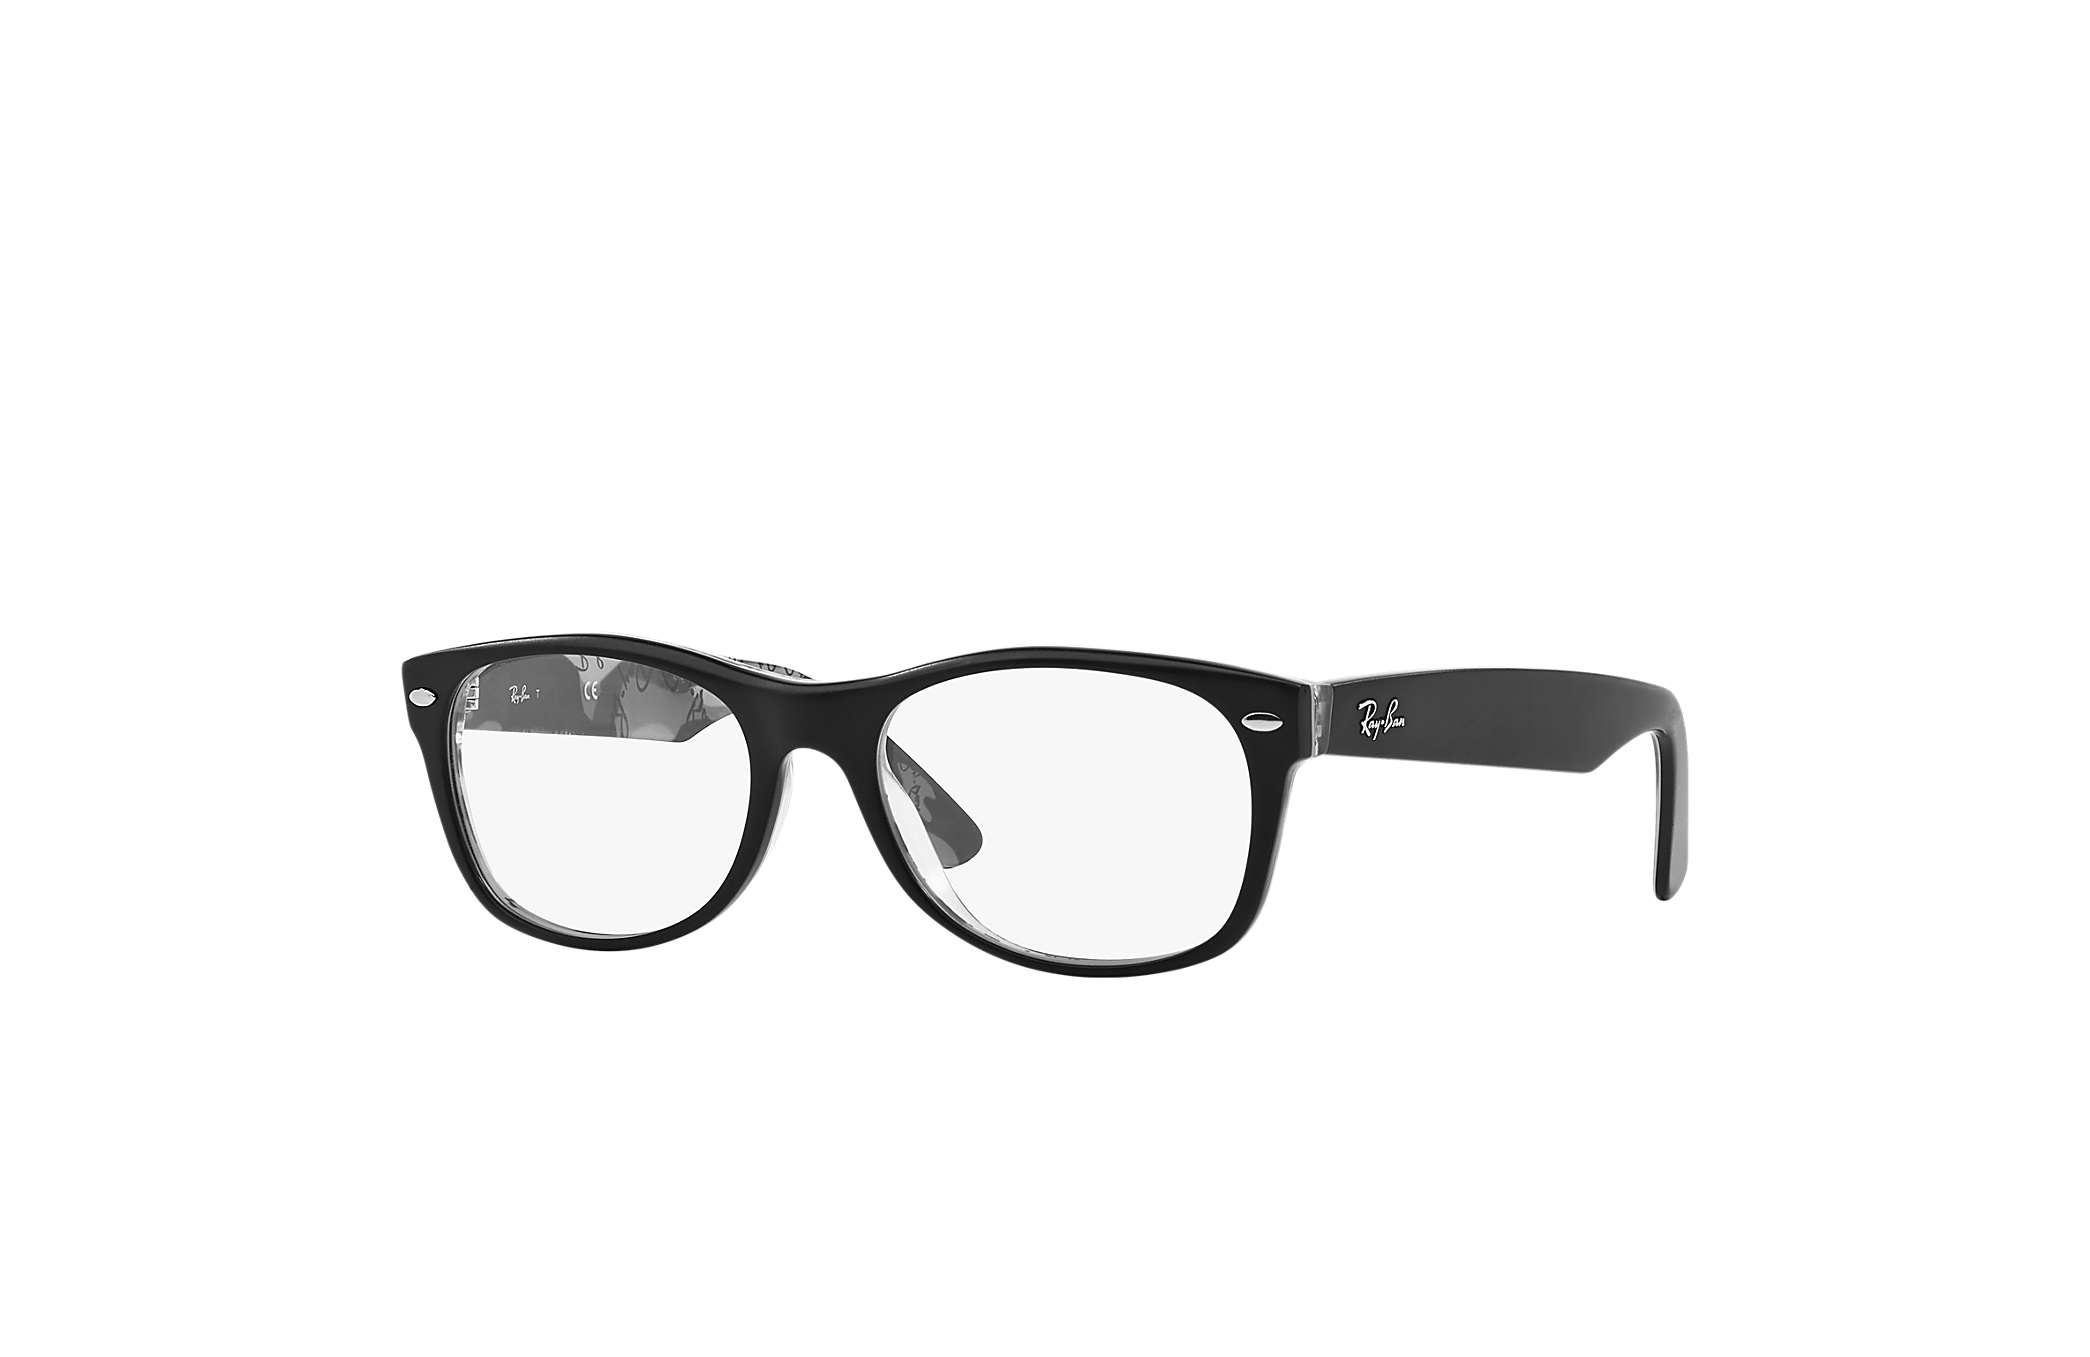 f44a7c68a6184 Óculos de grau Ray-Ban New Wayfarer Optics RB5184 Preto - Acetato ...